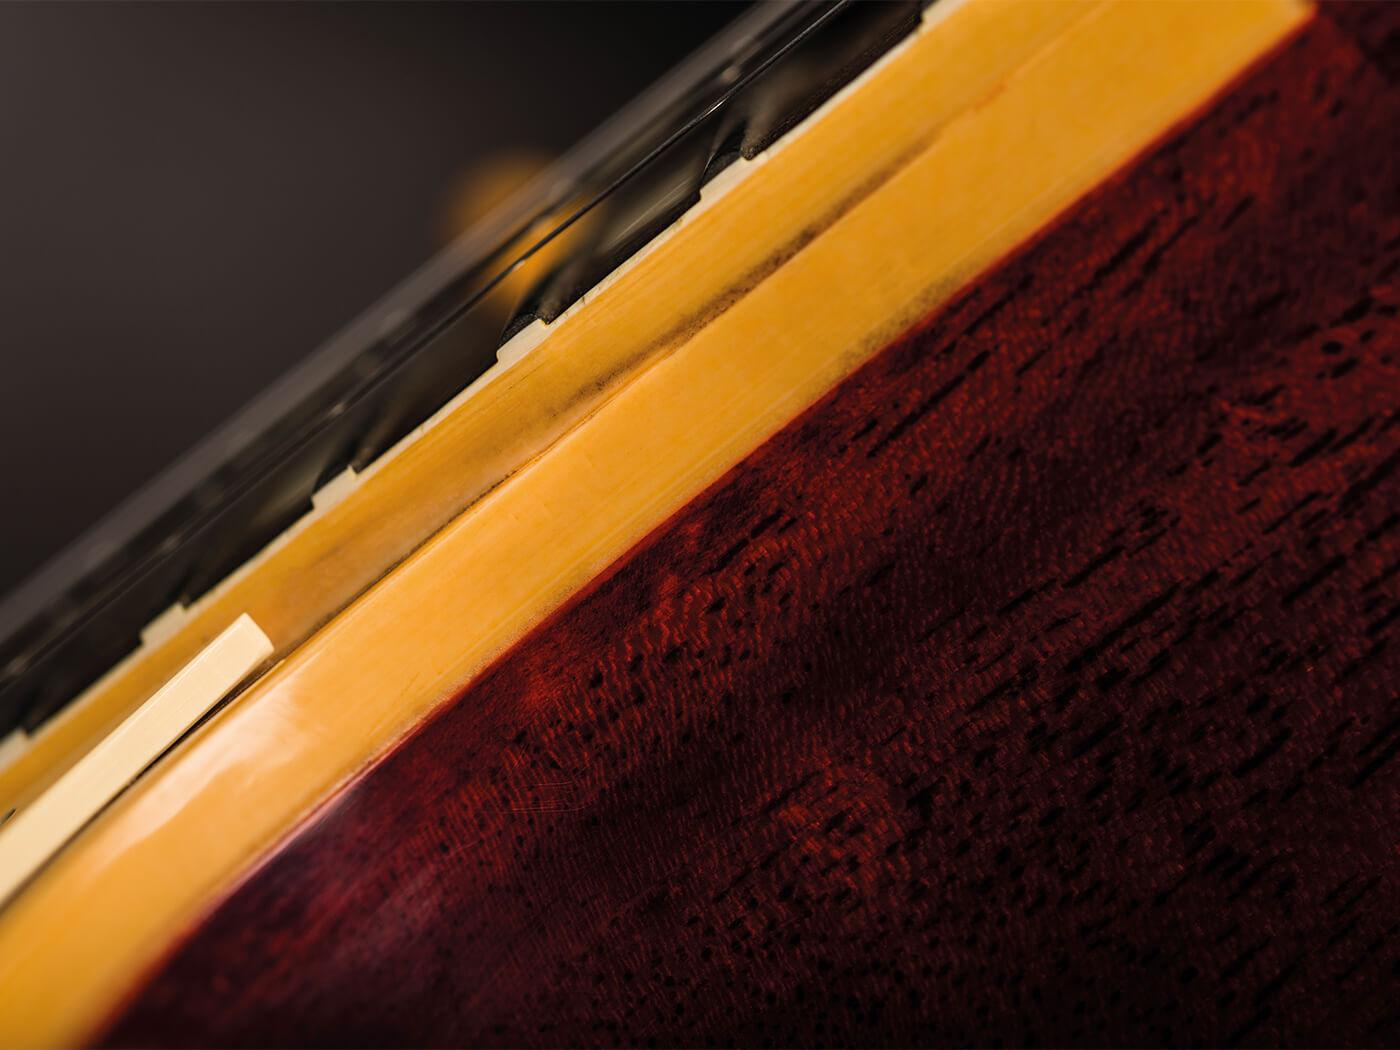 Gibson Custom 60th Anniversary 1959 Les Paul Standard cutaway